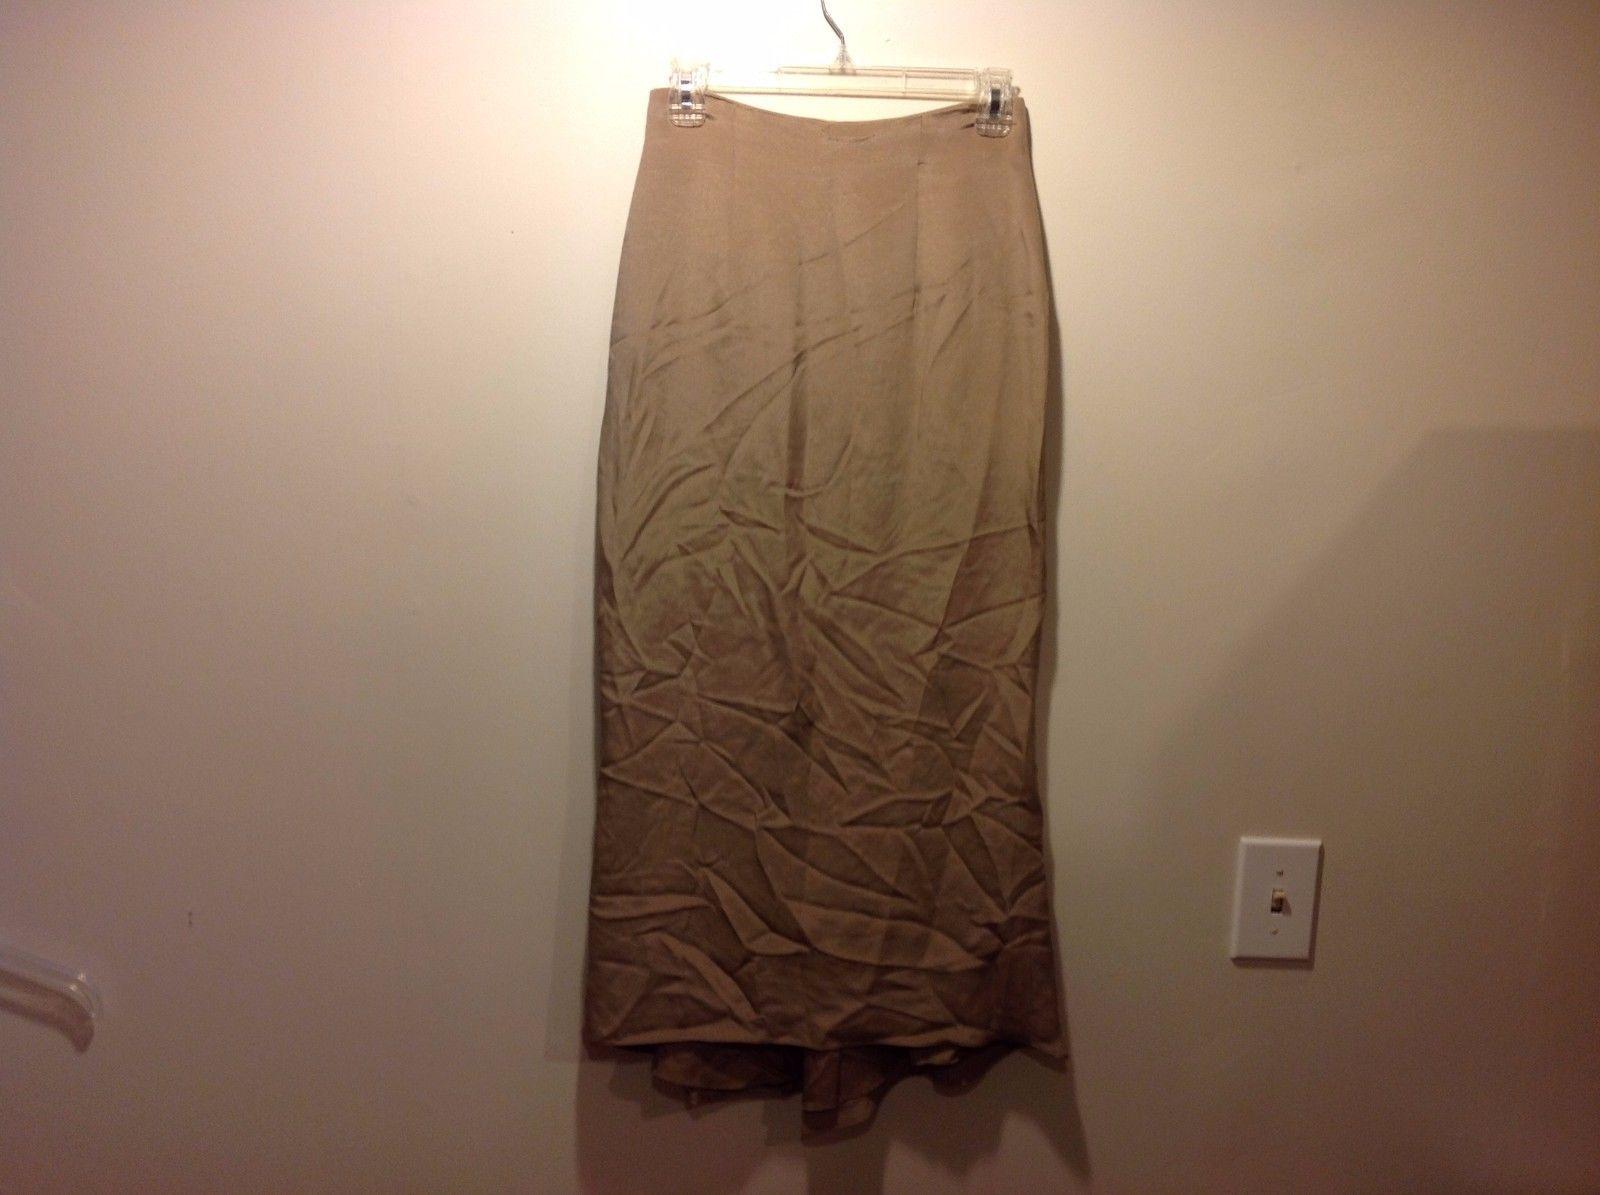 VIE by Victoria Royal 100% Silk Flowy Golden Long Skirt Sz 2P